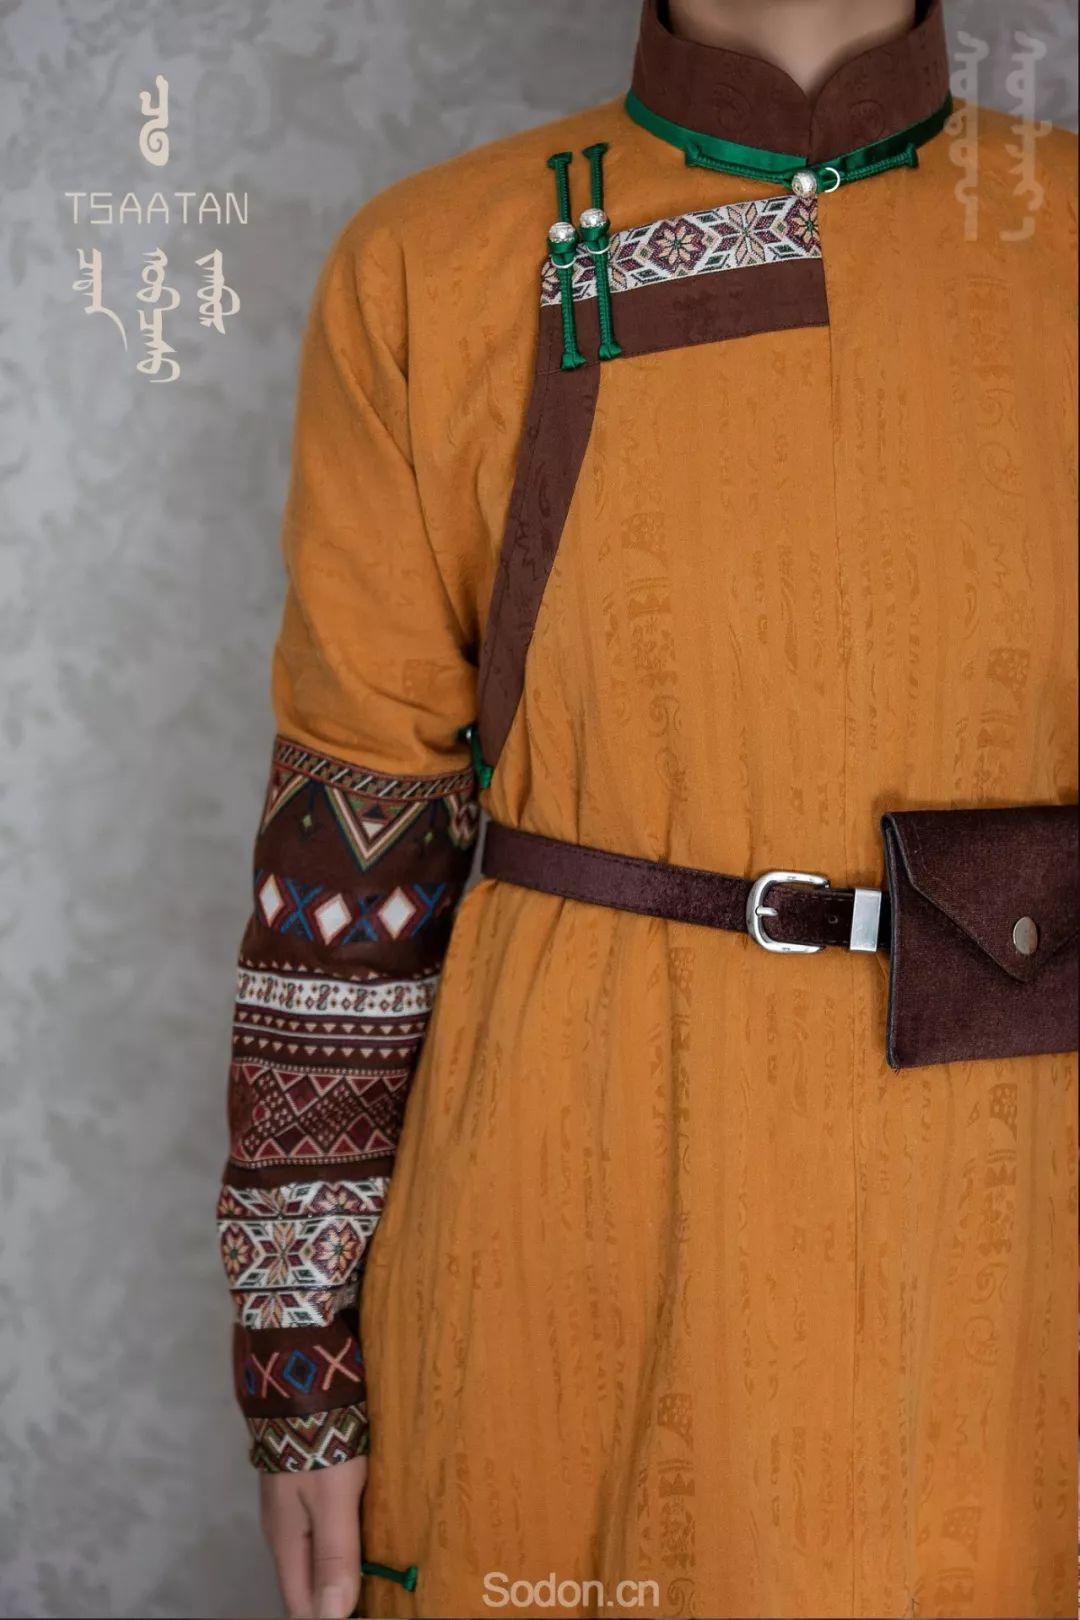 TSAATAN蒙古时装 2019夏季新款首发 第52张